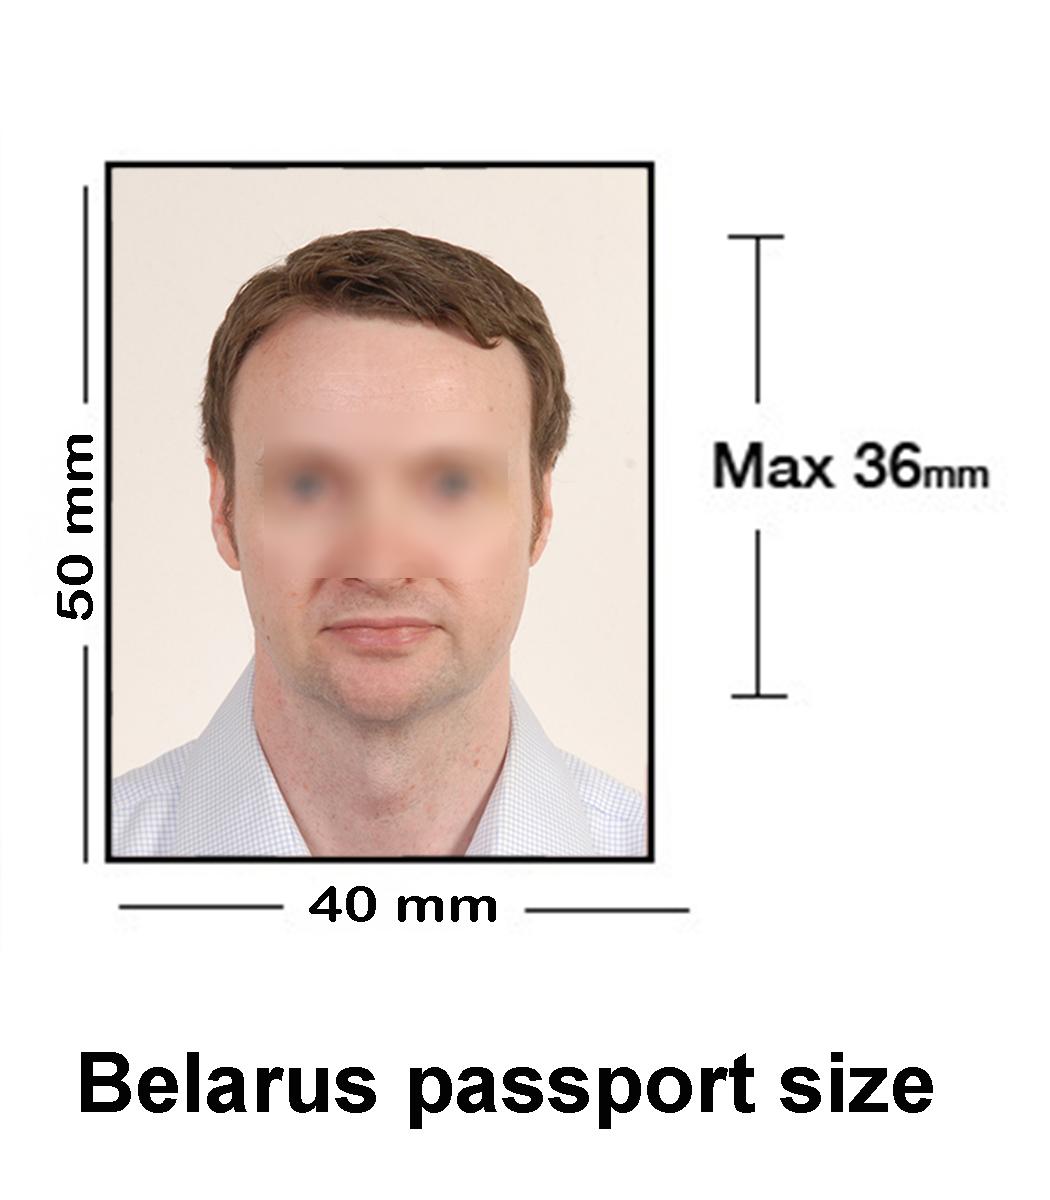 belarus-passport-size-02